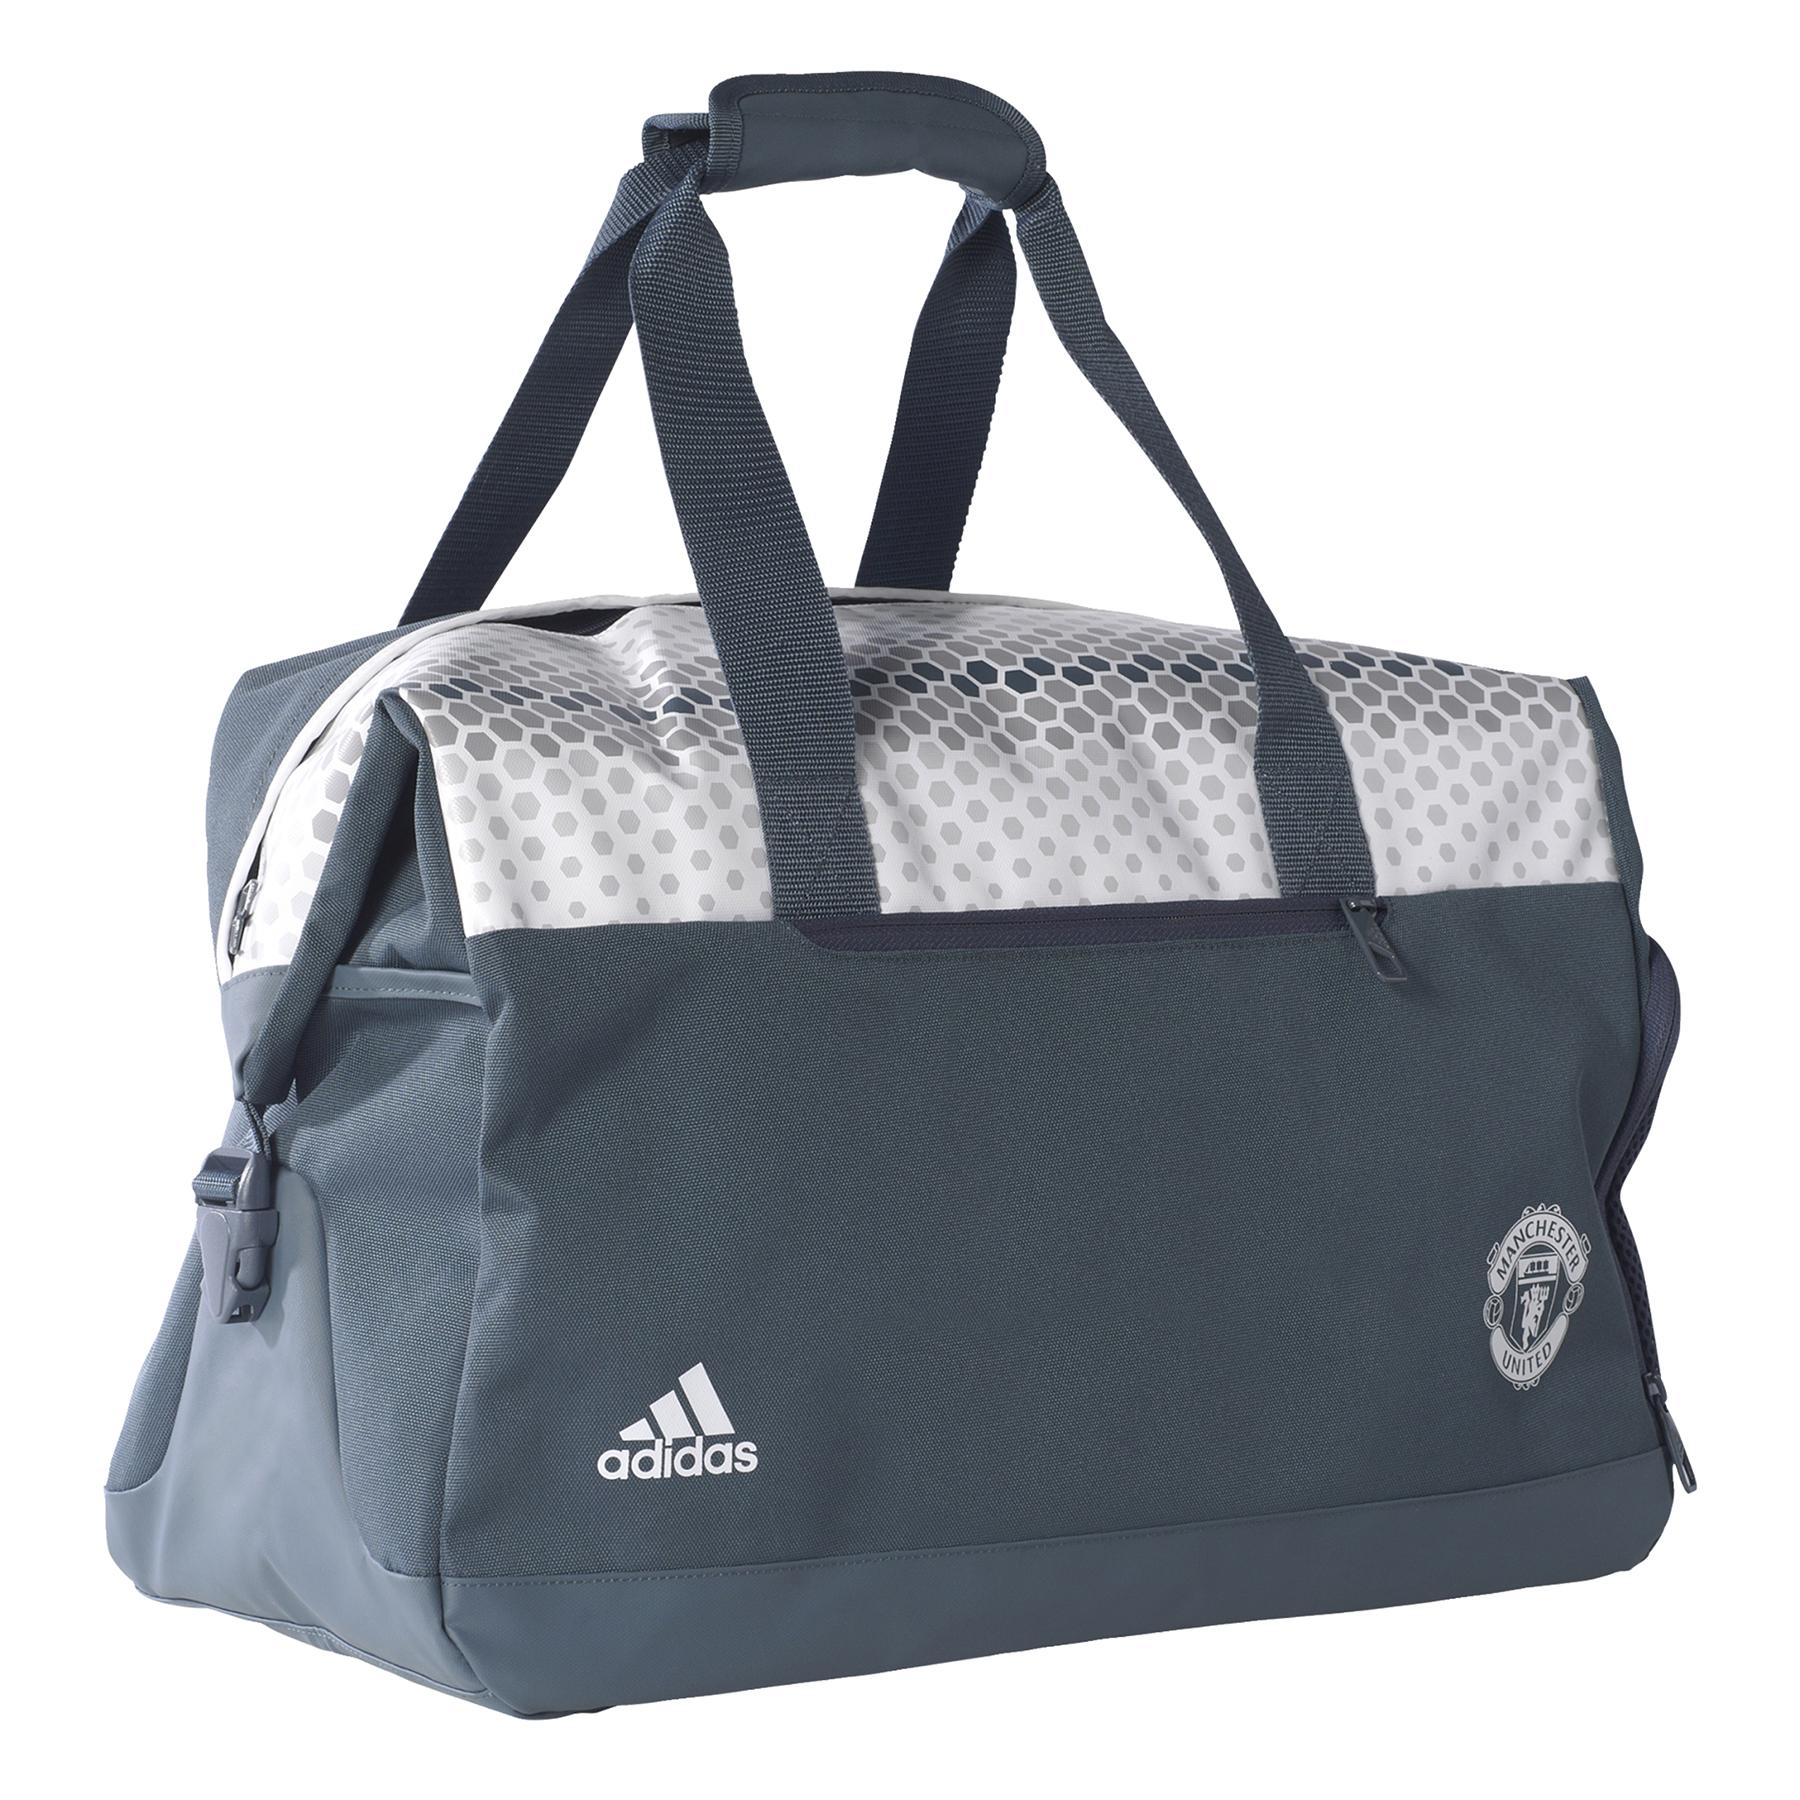 Manchester United Weekend Bag - Grey